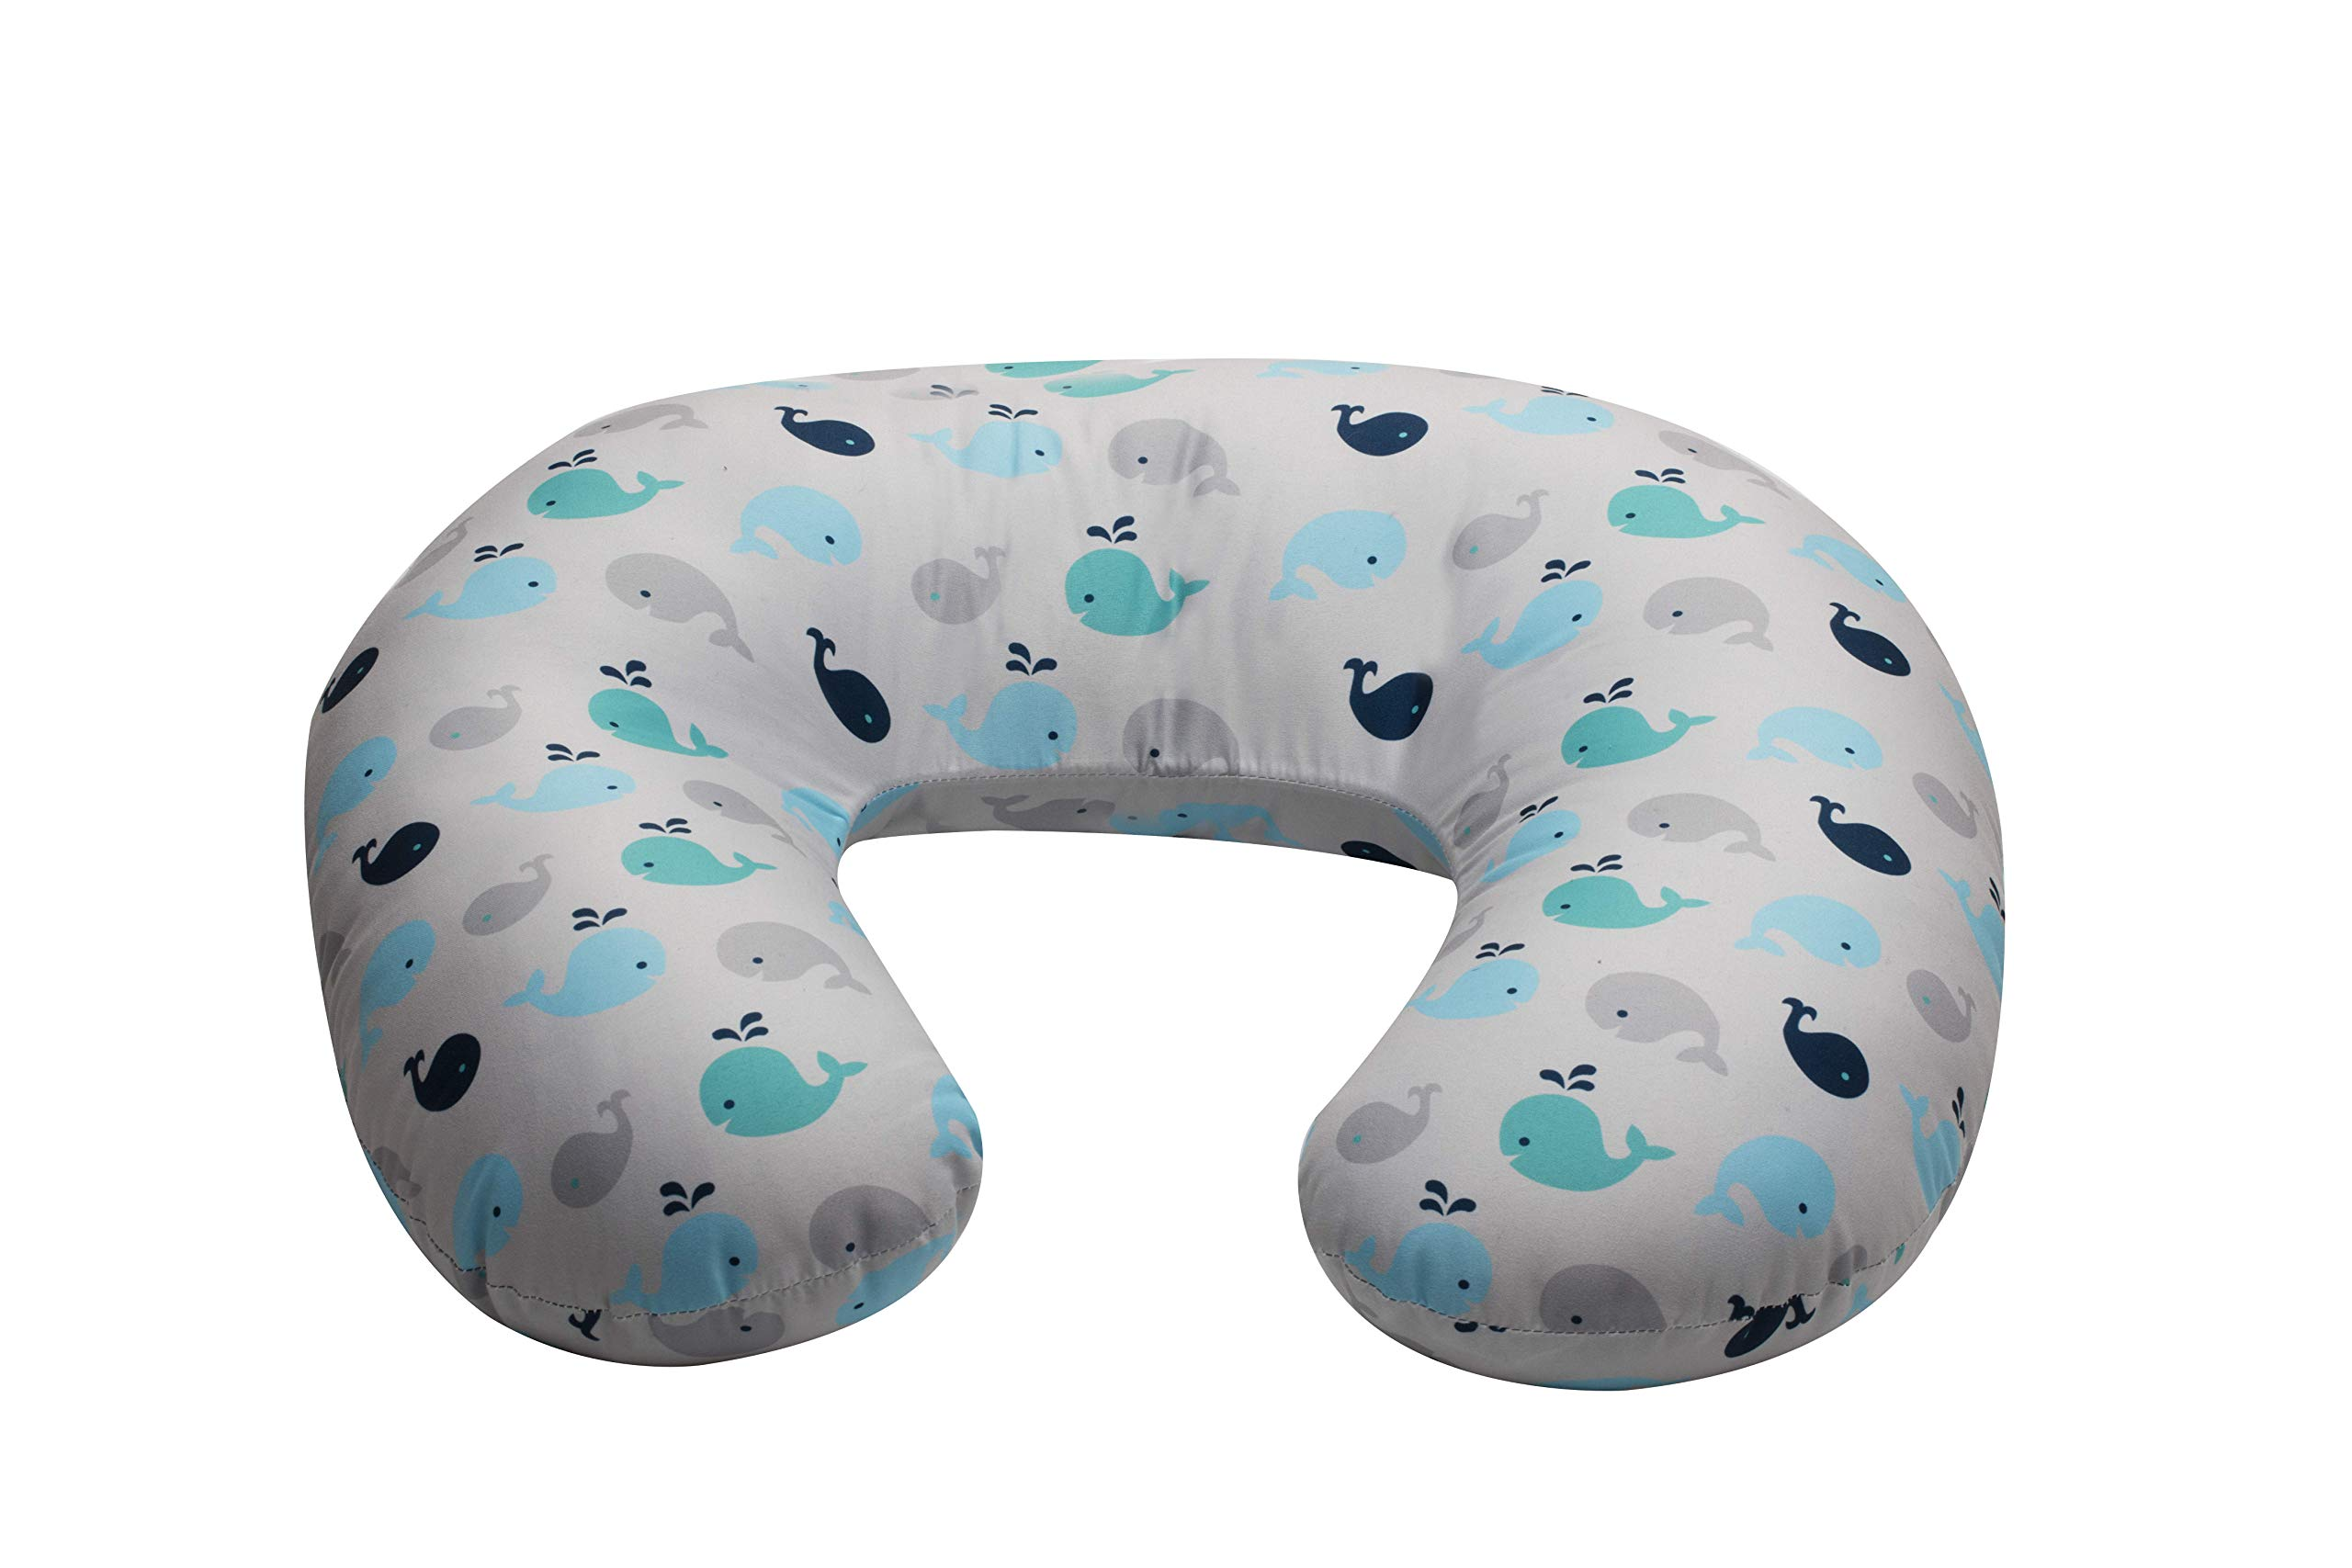 NurSit Basic Nursing Pillow and Positioner, Whales Print by World's Best